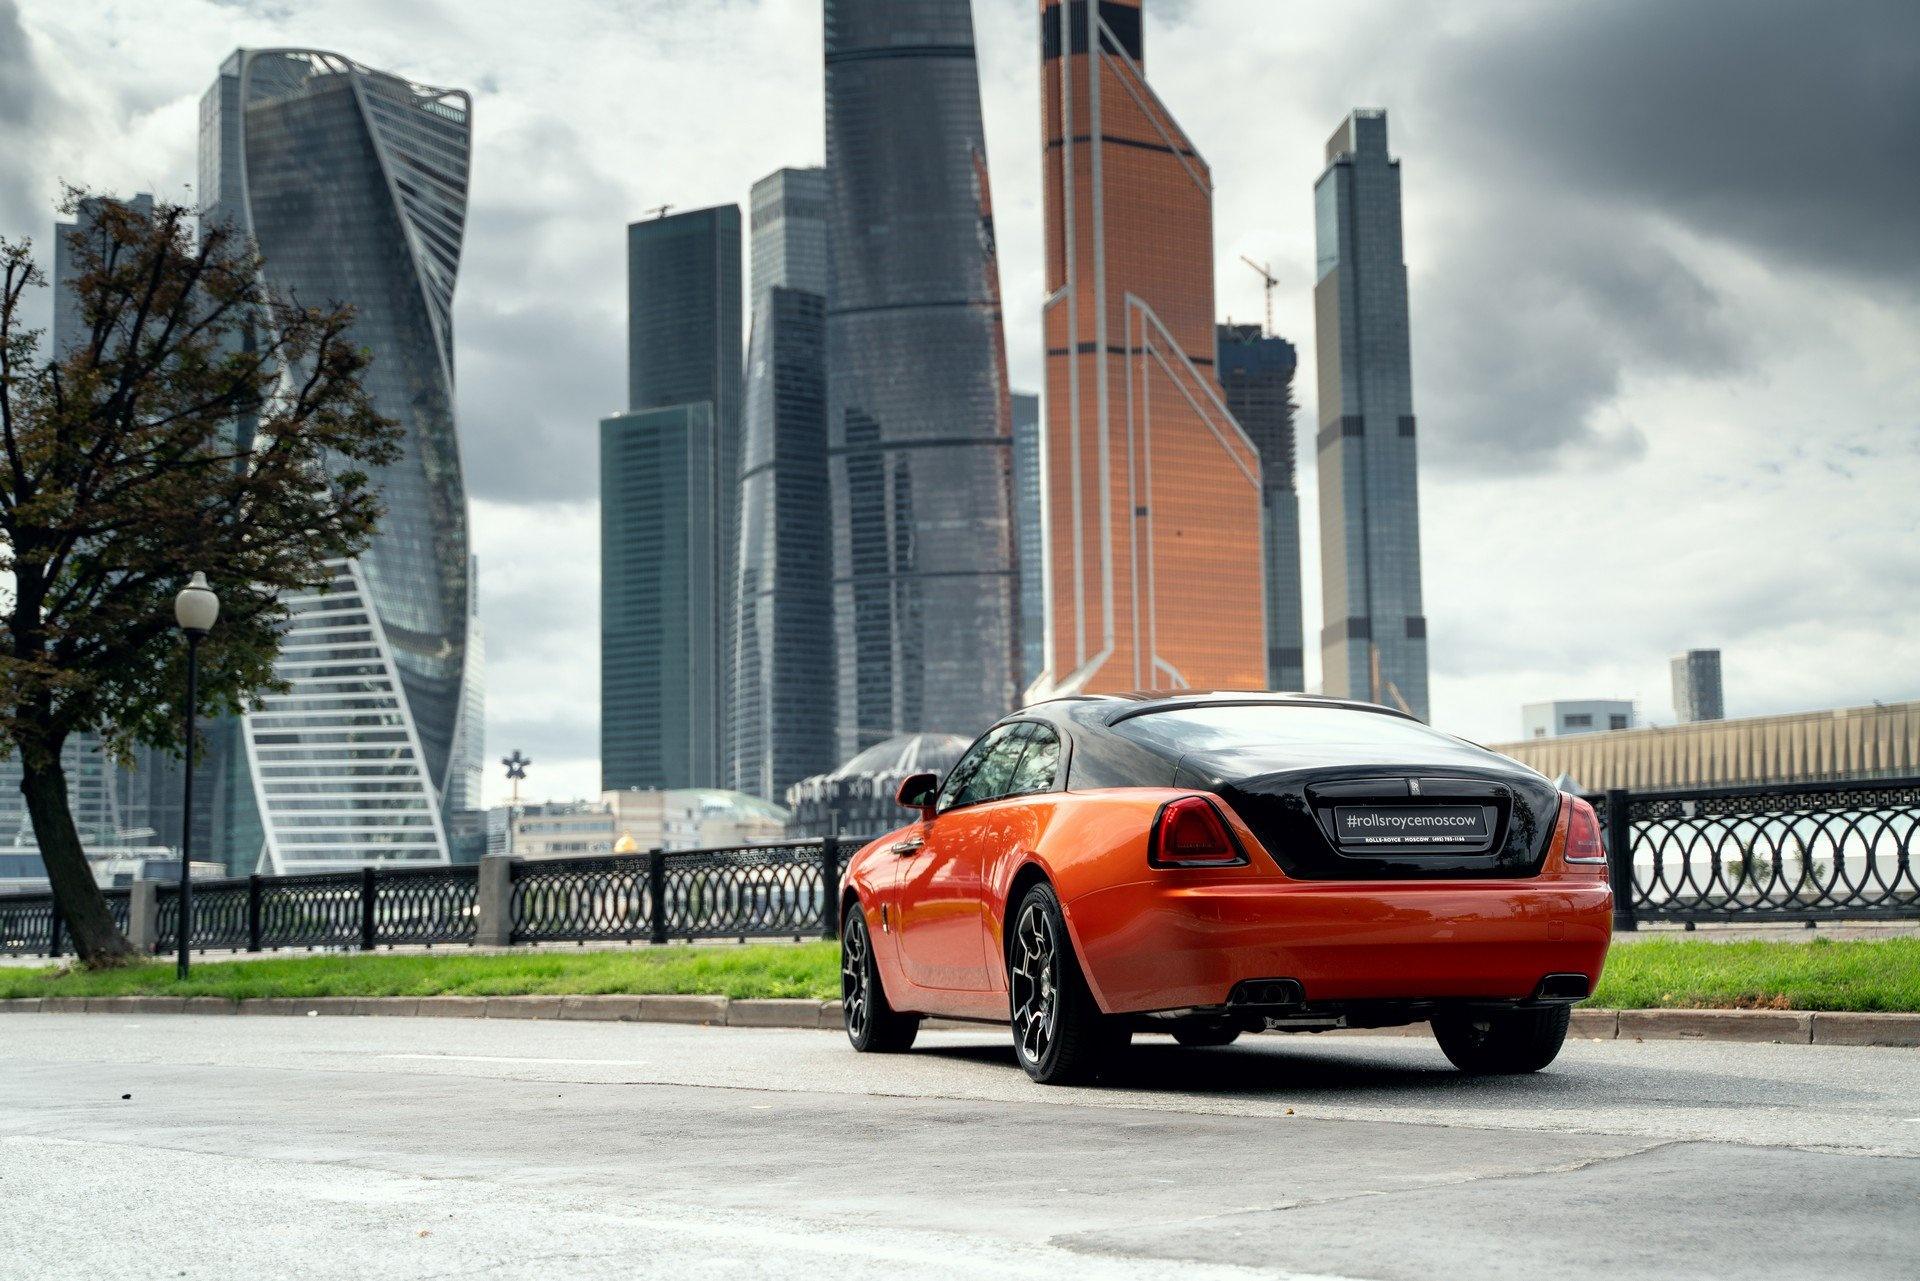 Ngam bo suu tap Rolls-Royce dac biet 'Dem Moscow' hinh anh 7